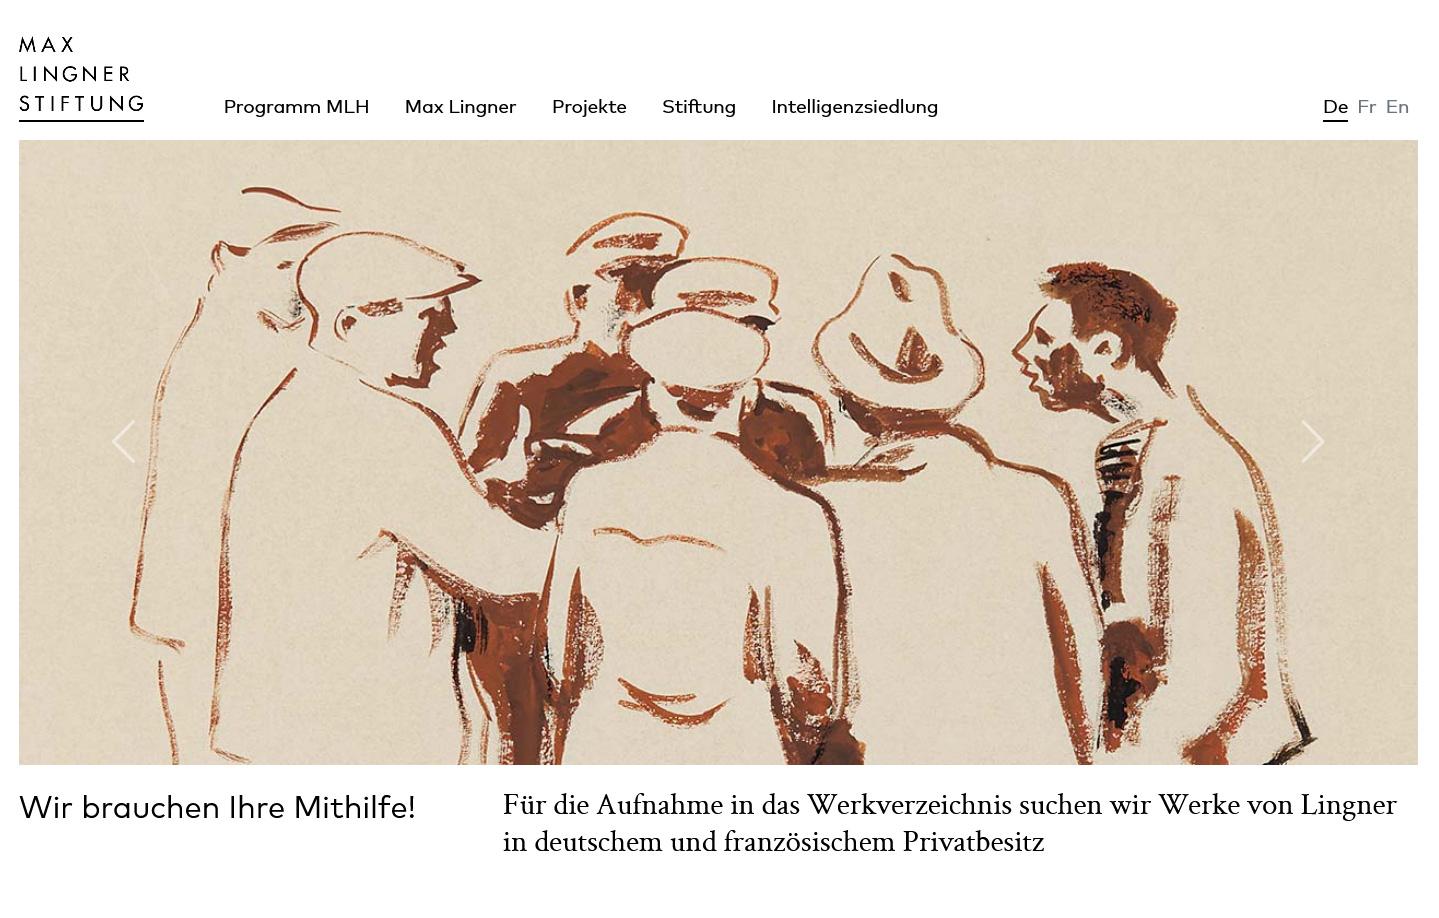 Screenshot 19.04.2021 https://www.max-lingner-stiftung.de